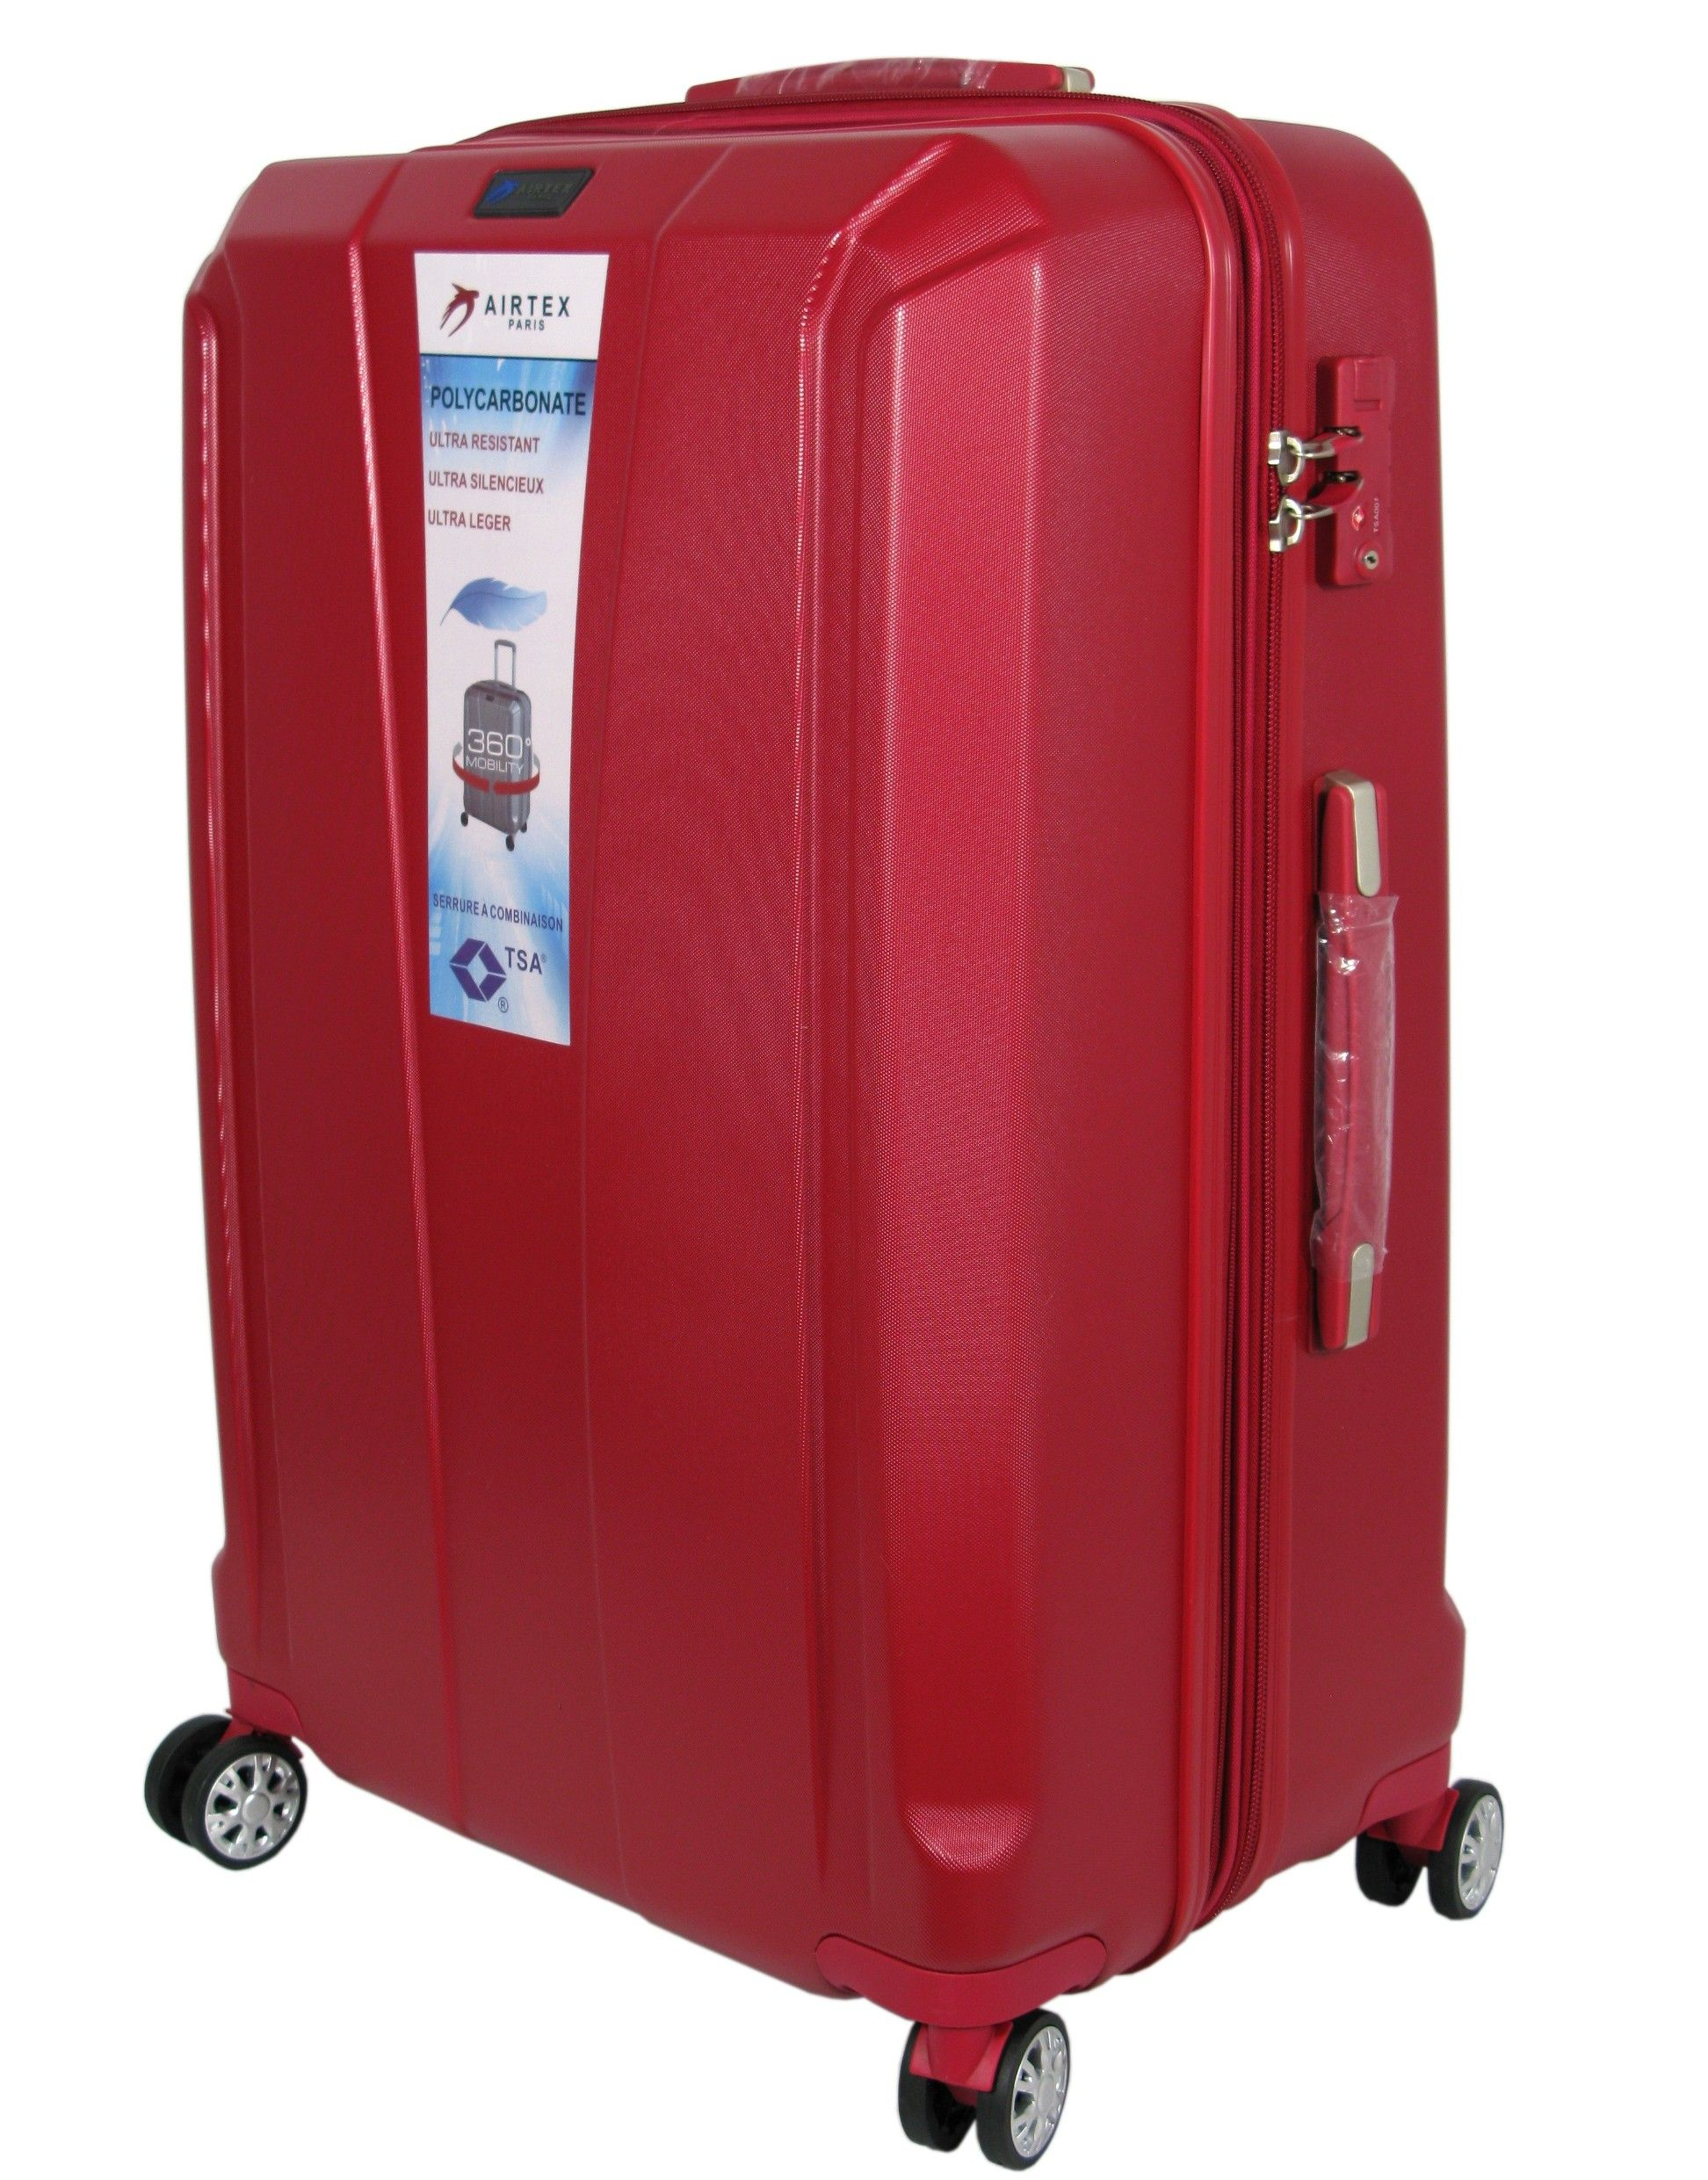 12140e3d2094c Mała walizka POLIWĘGLAN AIRTEX 953   Akcesoria skórzane ...